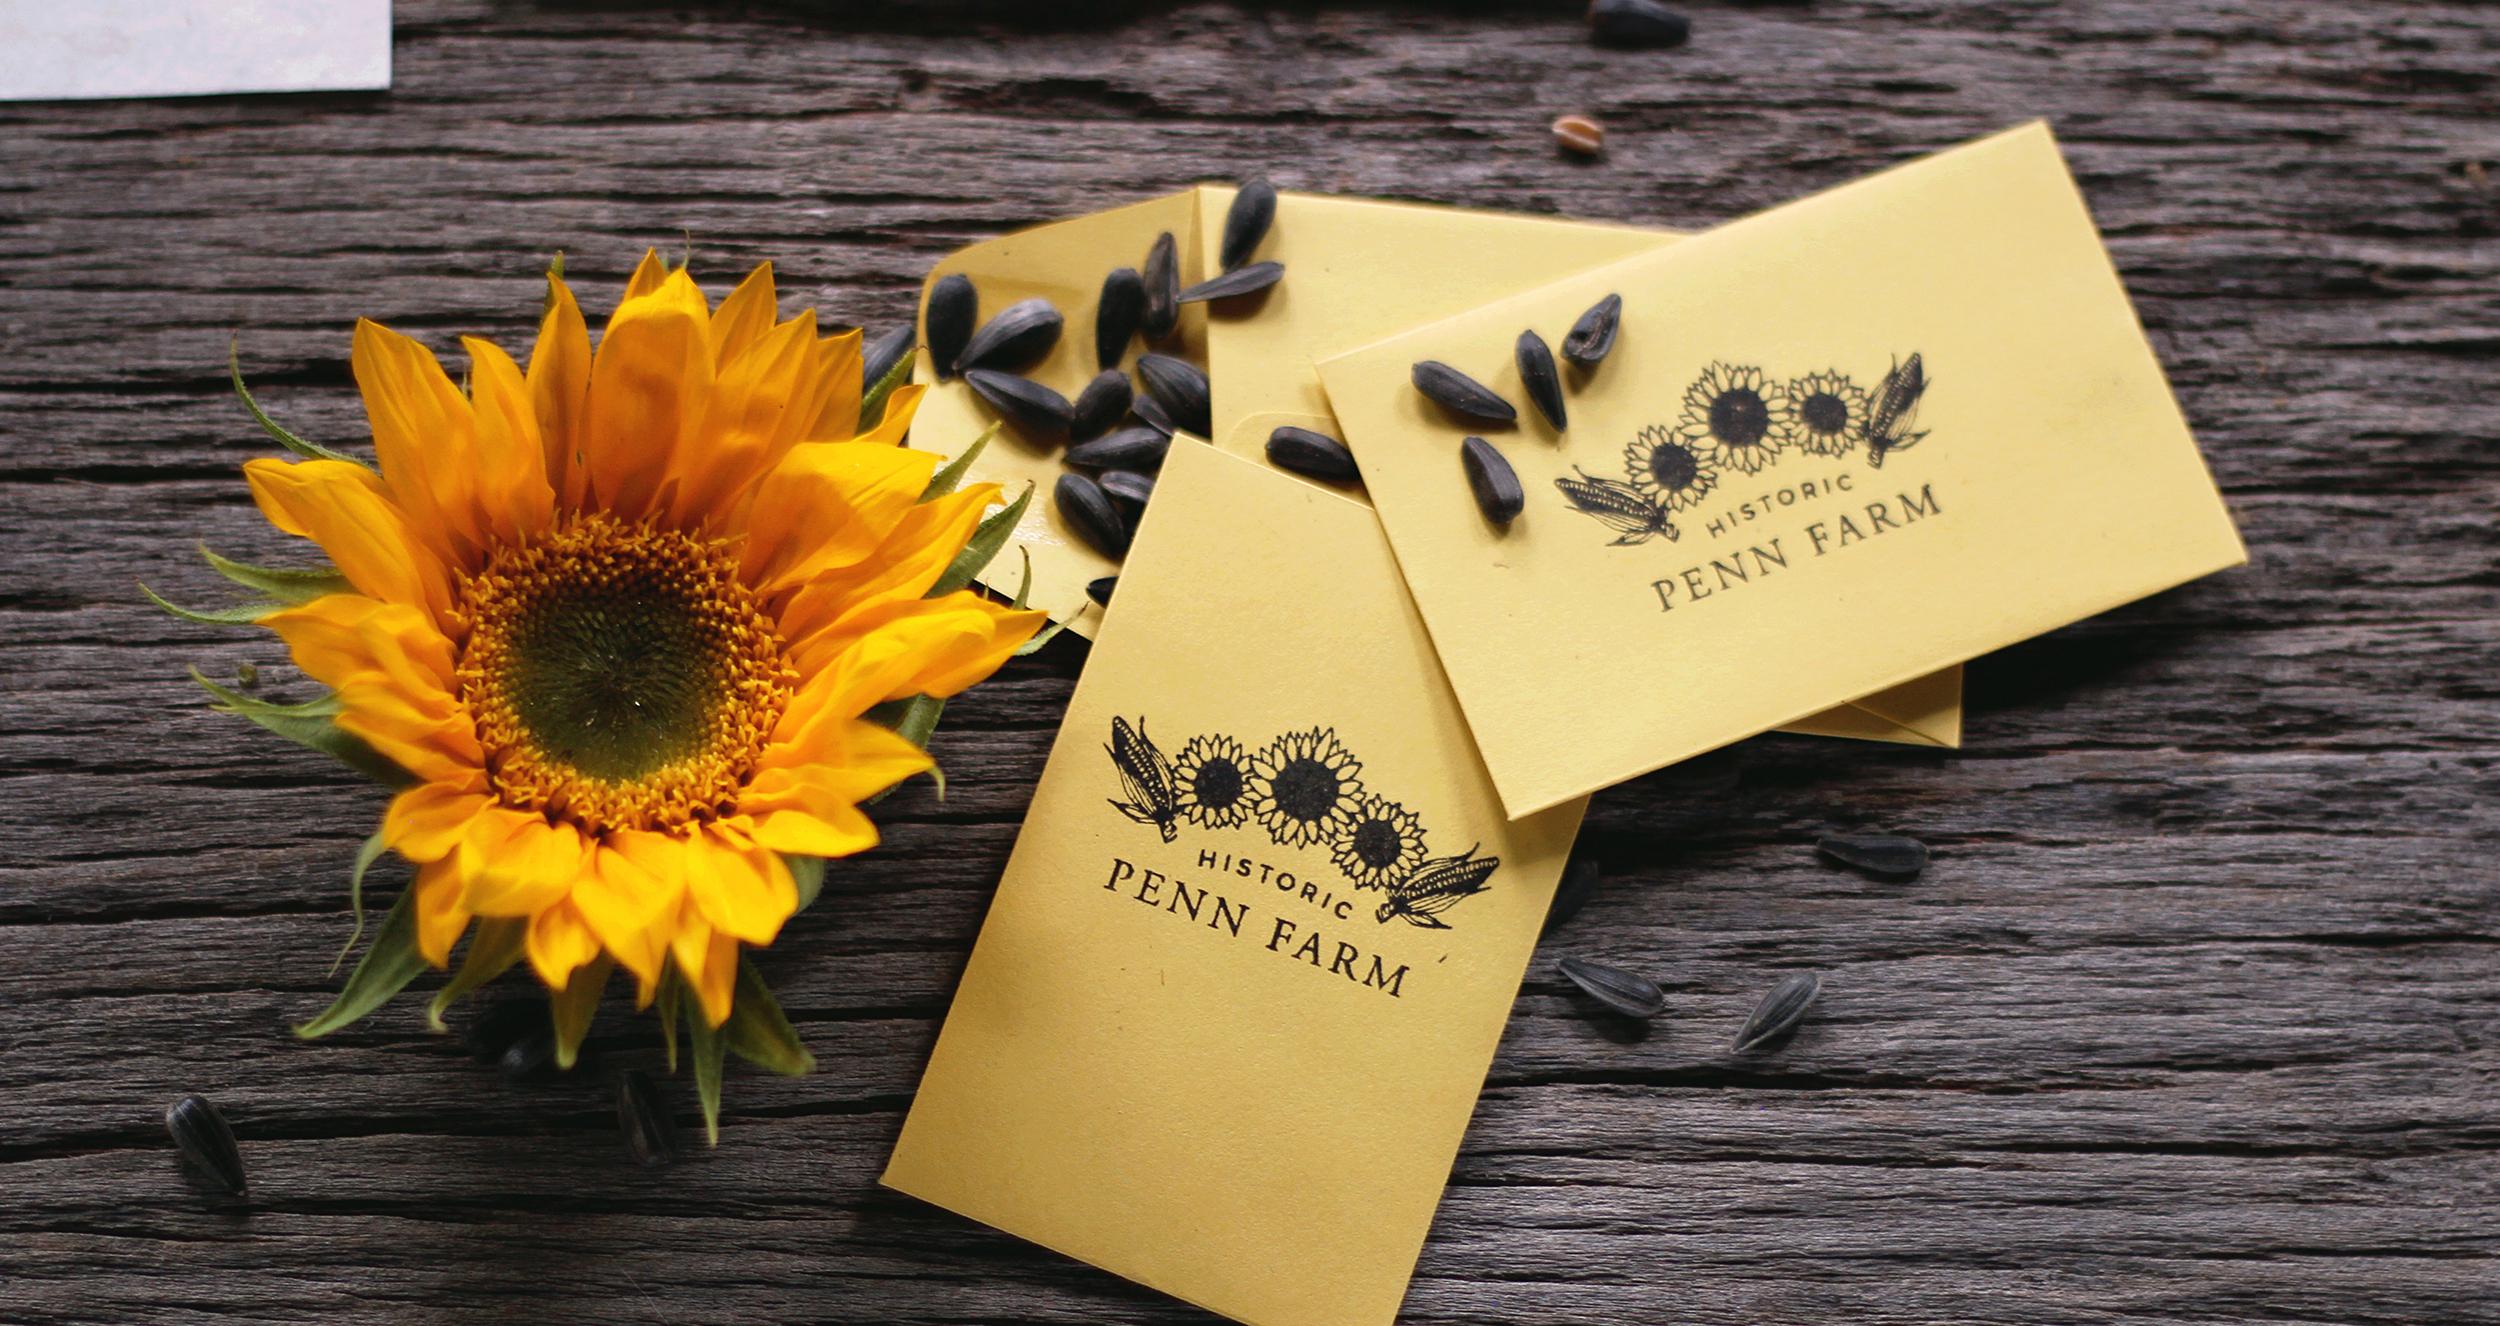 Wellstruck // Brand strategy and design for farm wedding venue Historic Penn Farm